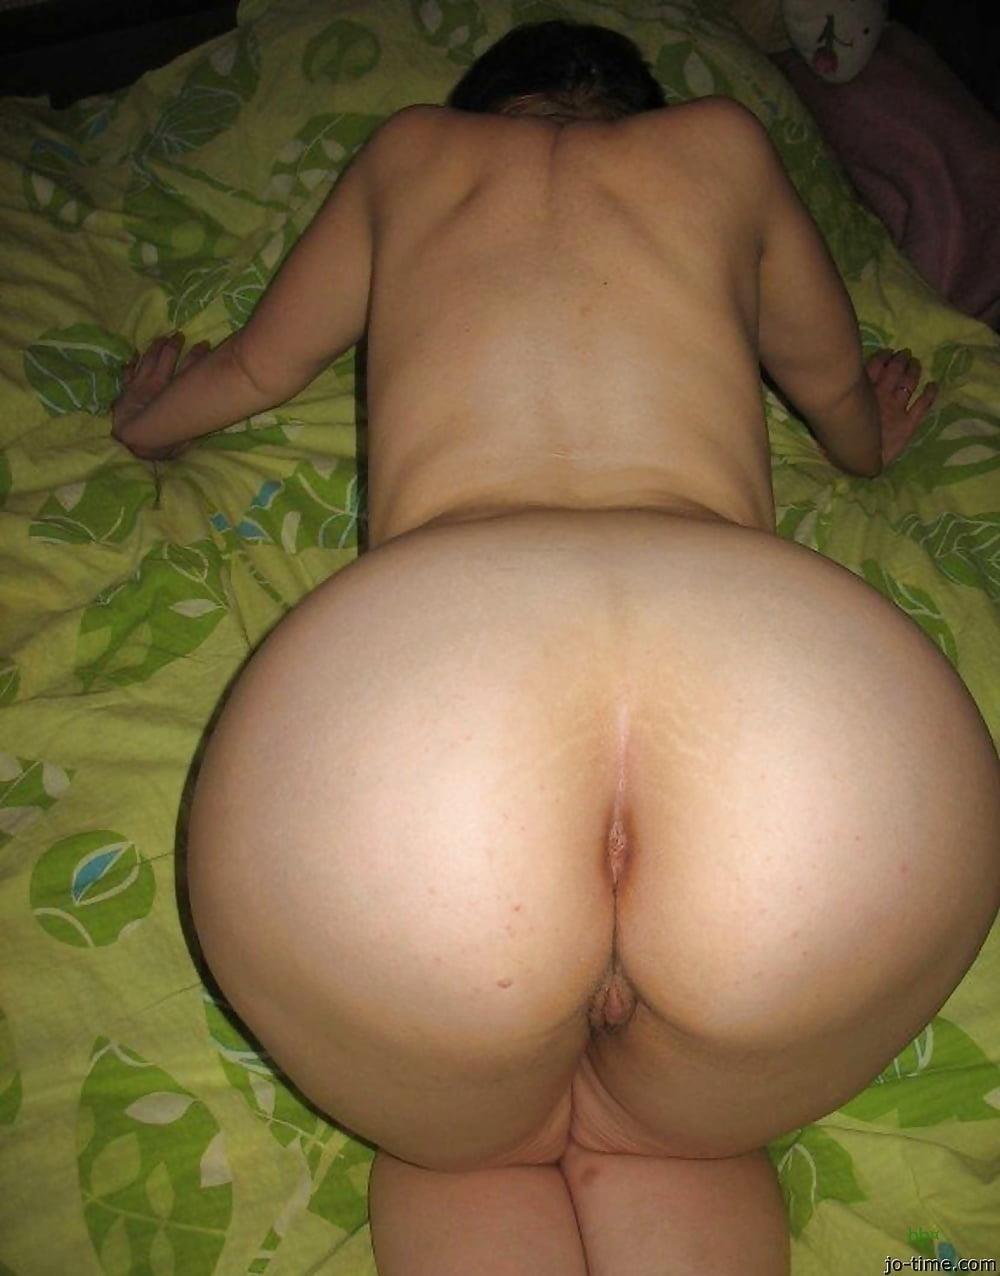 Mature wife anal pics-8355